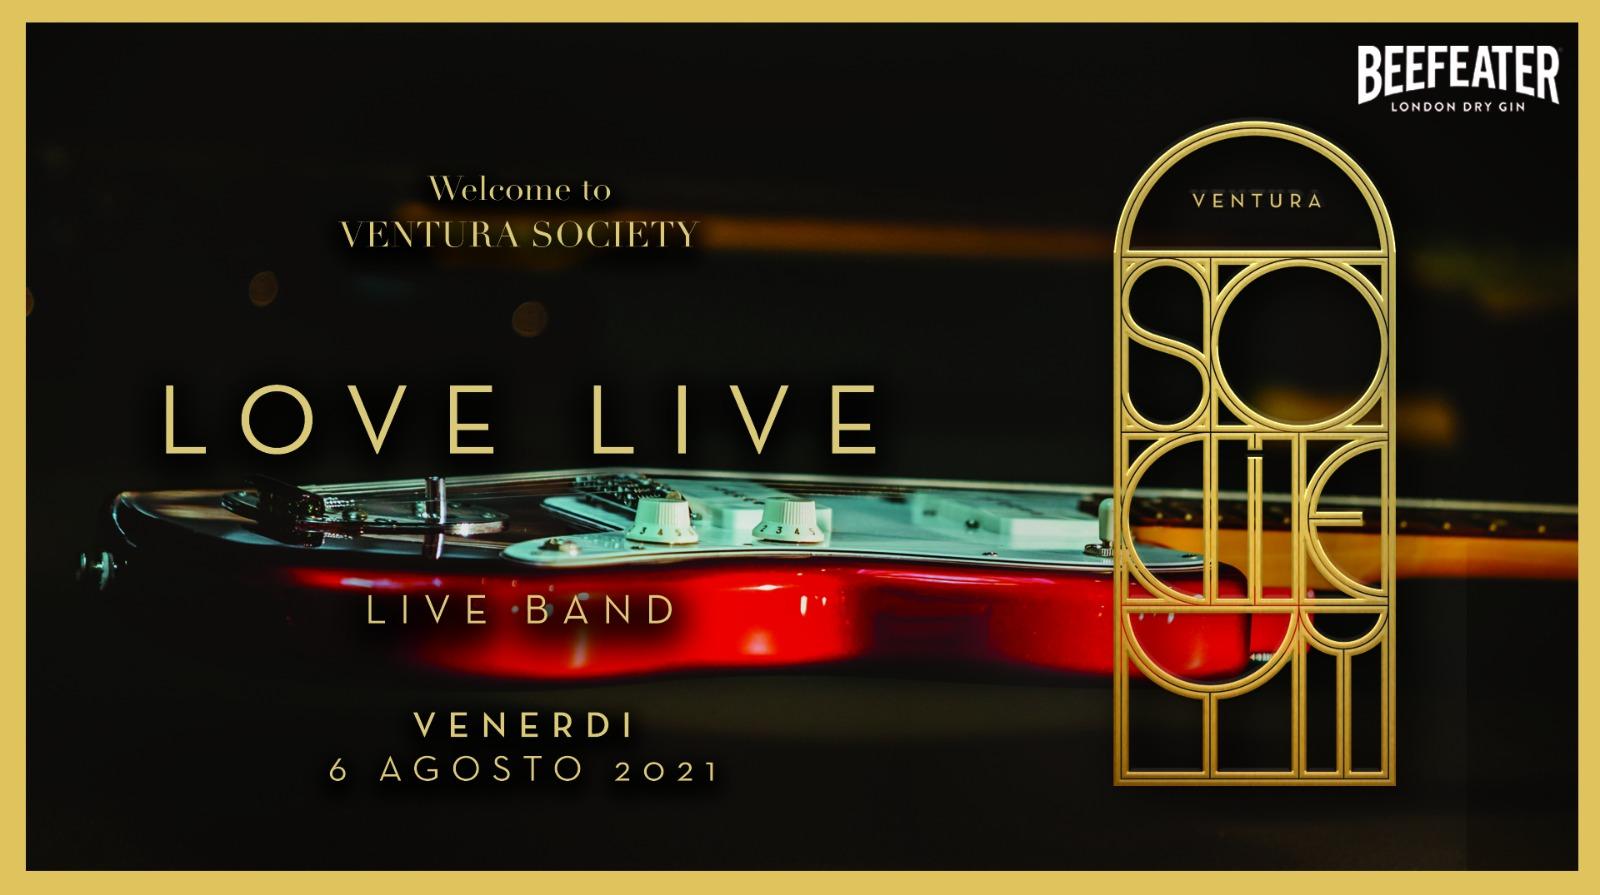 VENTURA SOCIETY ❃ LOVE LIVE ❃ YOUparti